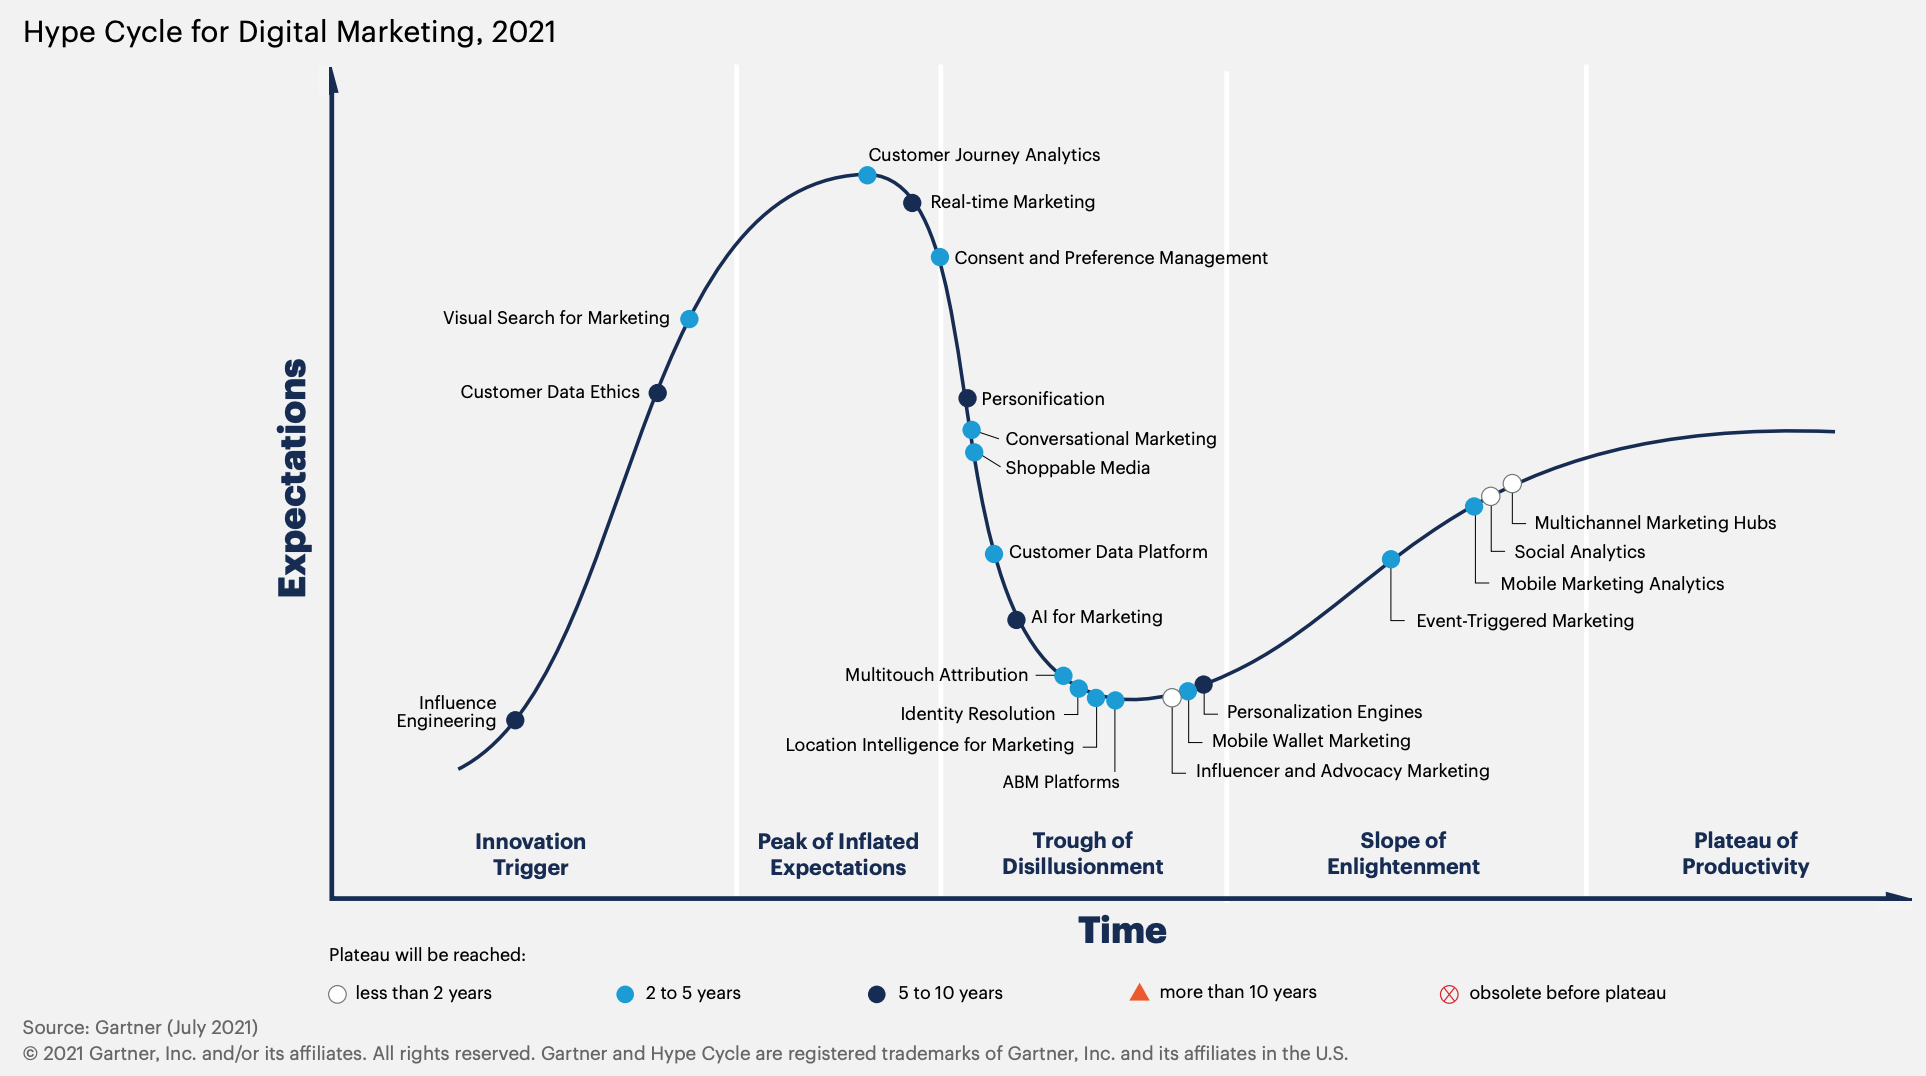 gartner hype cycle digital marketing 2021